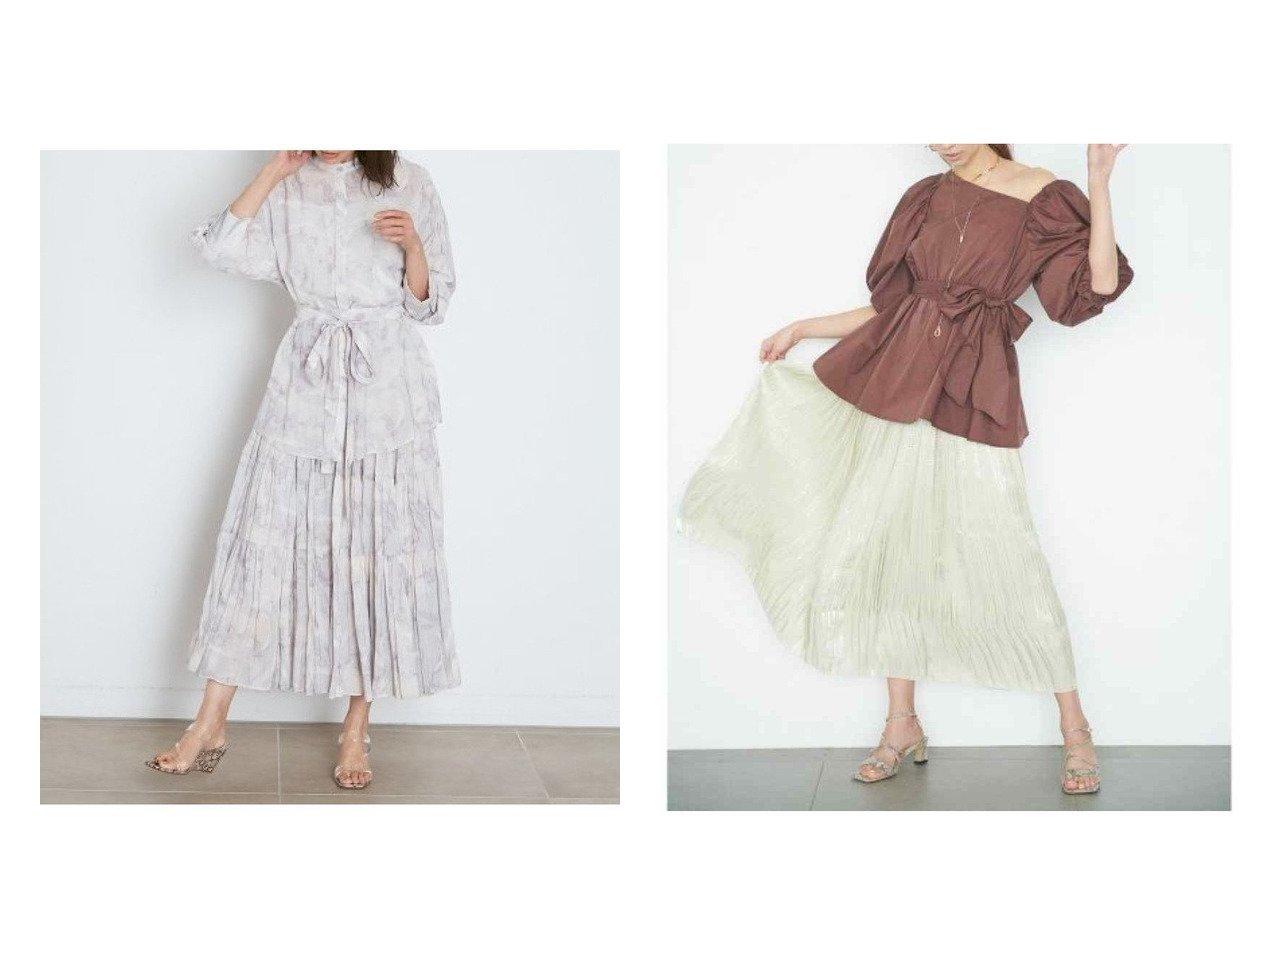 【SNIDEL/スナイデル】のシアーボリュームティアードスカート&【CELFORD/セルフォード】のオーロラサテンプリーツスカート スカートのおすすめ!人気、トレンド・レディースファッションの通販 おすすめで人気の流行・トレンド、ファッションの通販商品 メンズファッション・キッズファッション・インテリア・家具・レディースファッション・服の通販 founy(ファニー) https://founy.com/ ファッション Fashion レディースファッション WOMEN スカート Skirt ミニスカート Mini Skirts プリーツスカート Pleated Skirts ティアードスカート Tiered Skirts ロングスカート Long Skirt NEW・新作・新着・新入荷 New Arrivals インナー サテン パープル プリーツ ミニスカート 再入荷 Restock/Back in Stock/Re Arrival 無地 シアー セットアップ ティアードスカート プリント マーブル ミックス ロング |ID:crp329100000011760